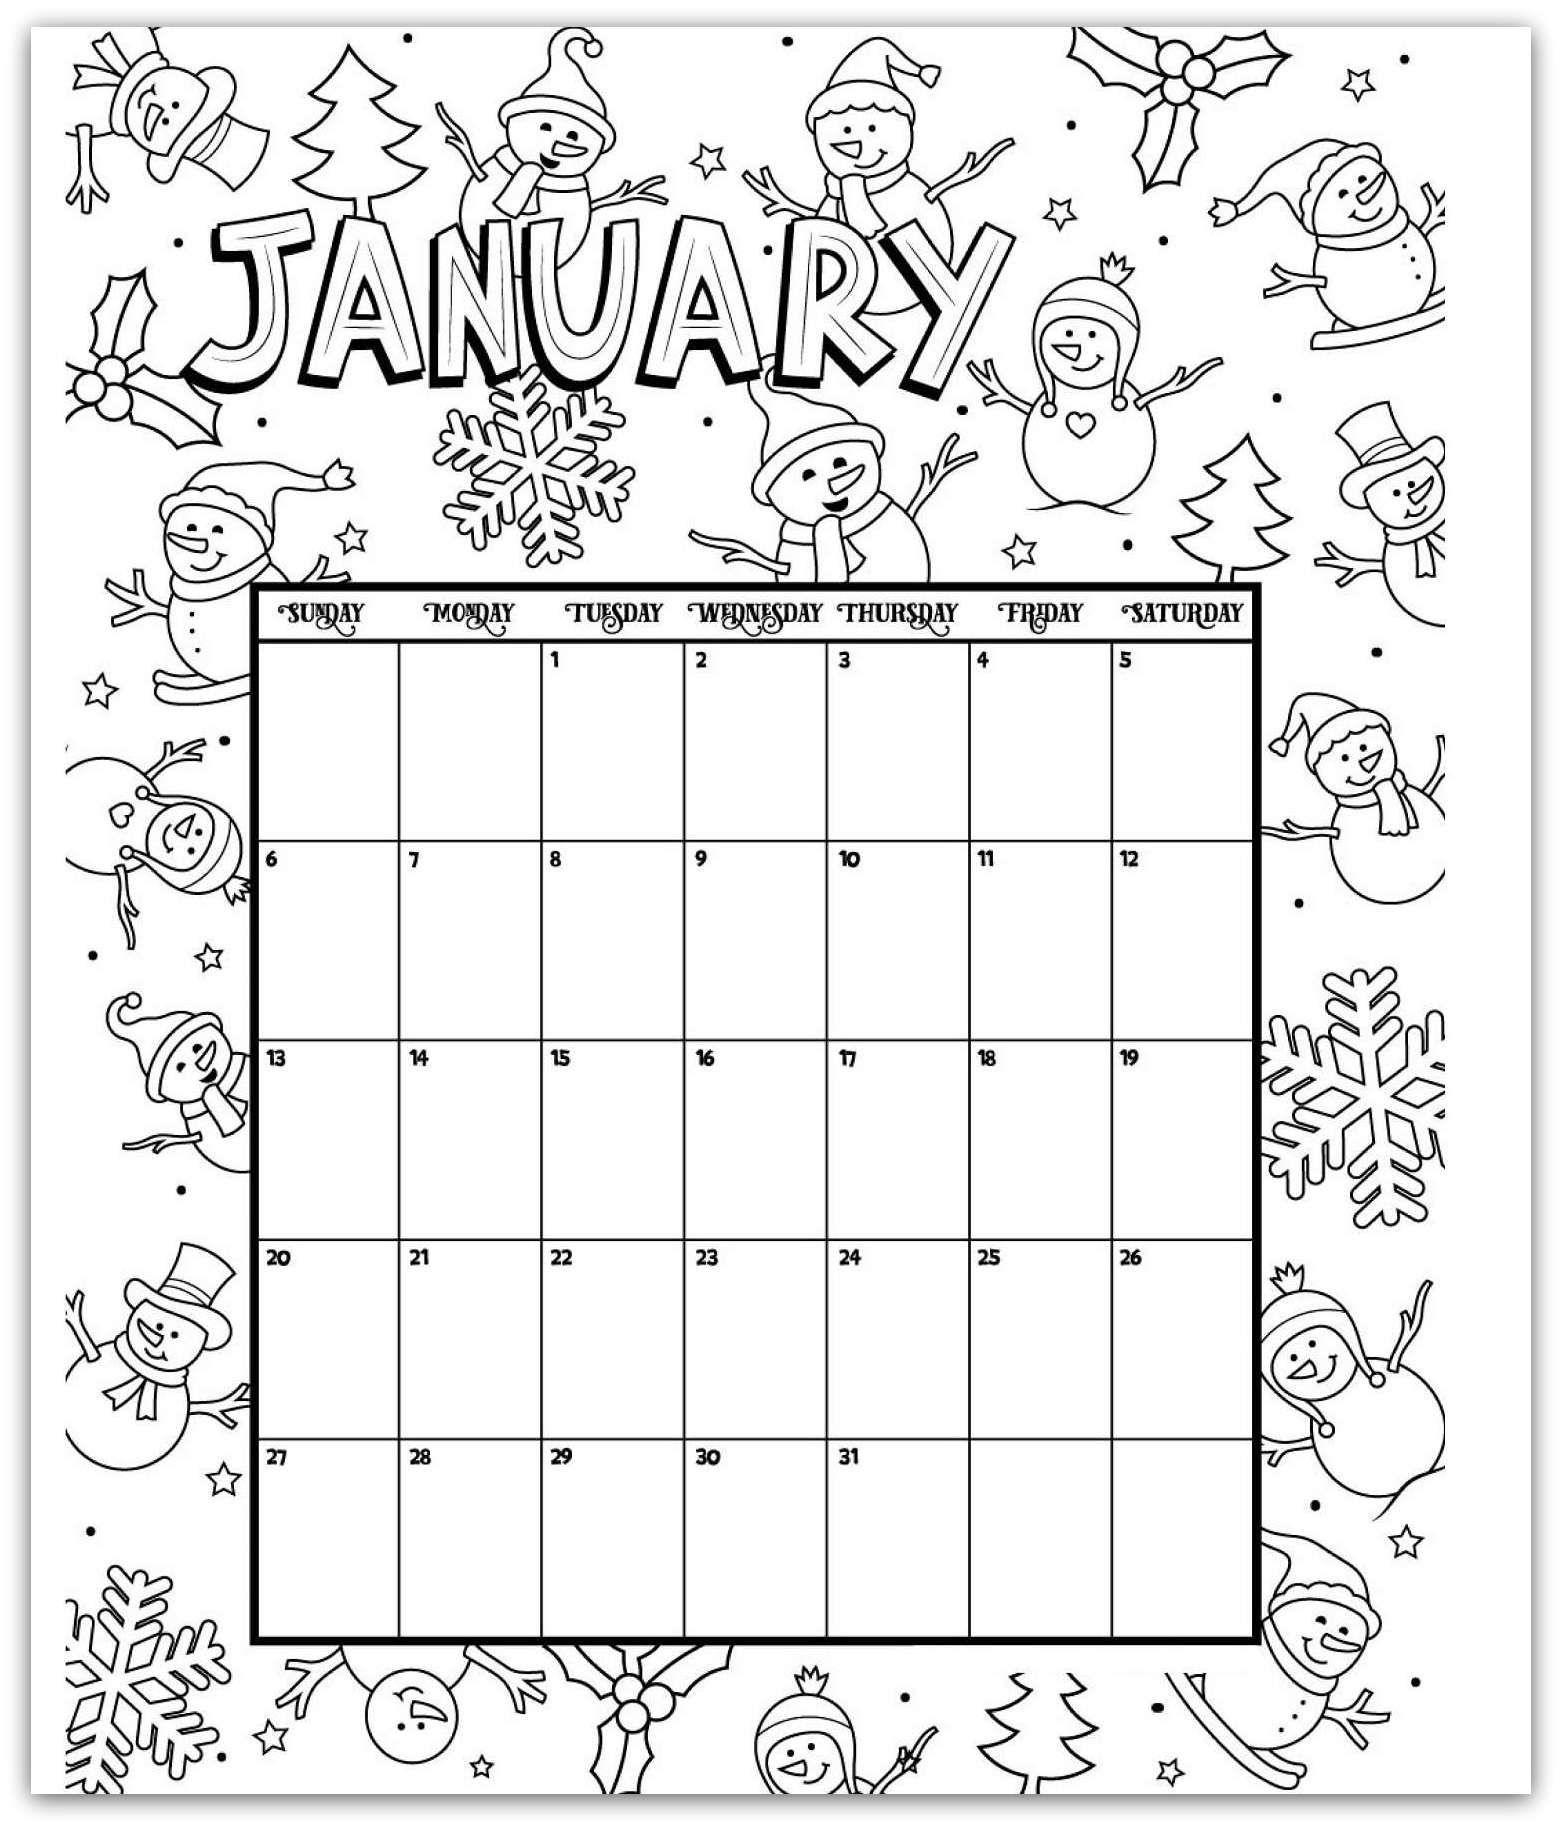 January 2019 Coloring Page Printable Calendar | Kids